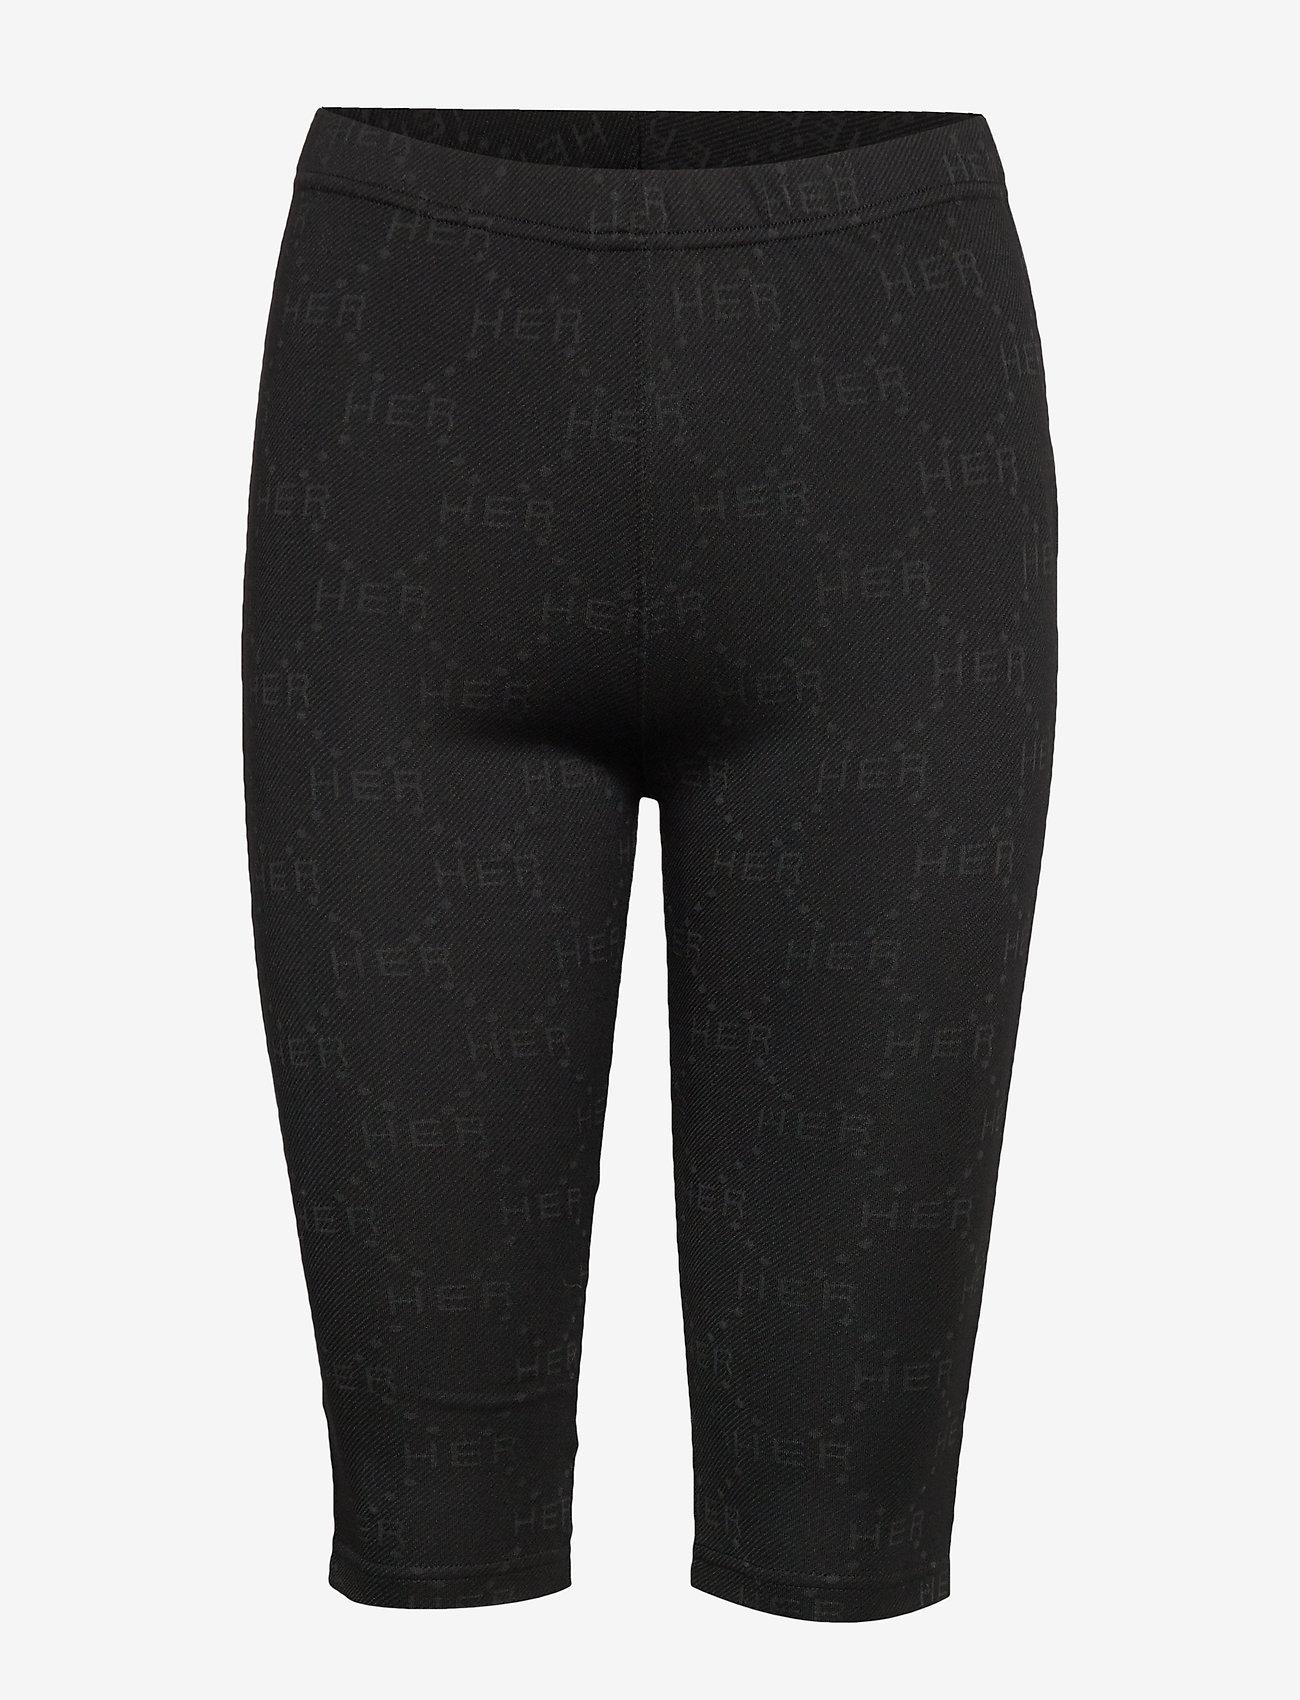 Birgitte Herskind - Bike Biker shorts - cycling shorts - black logo - 1